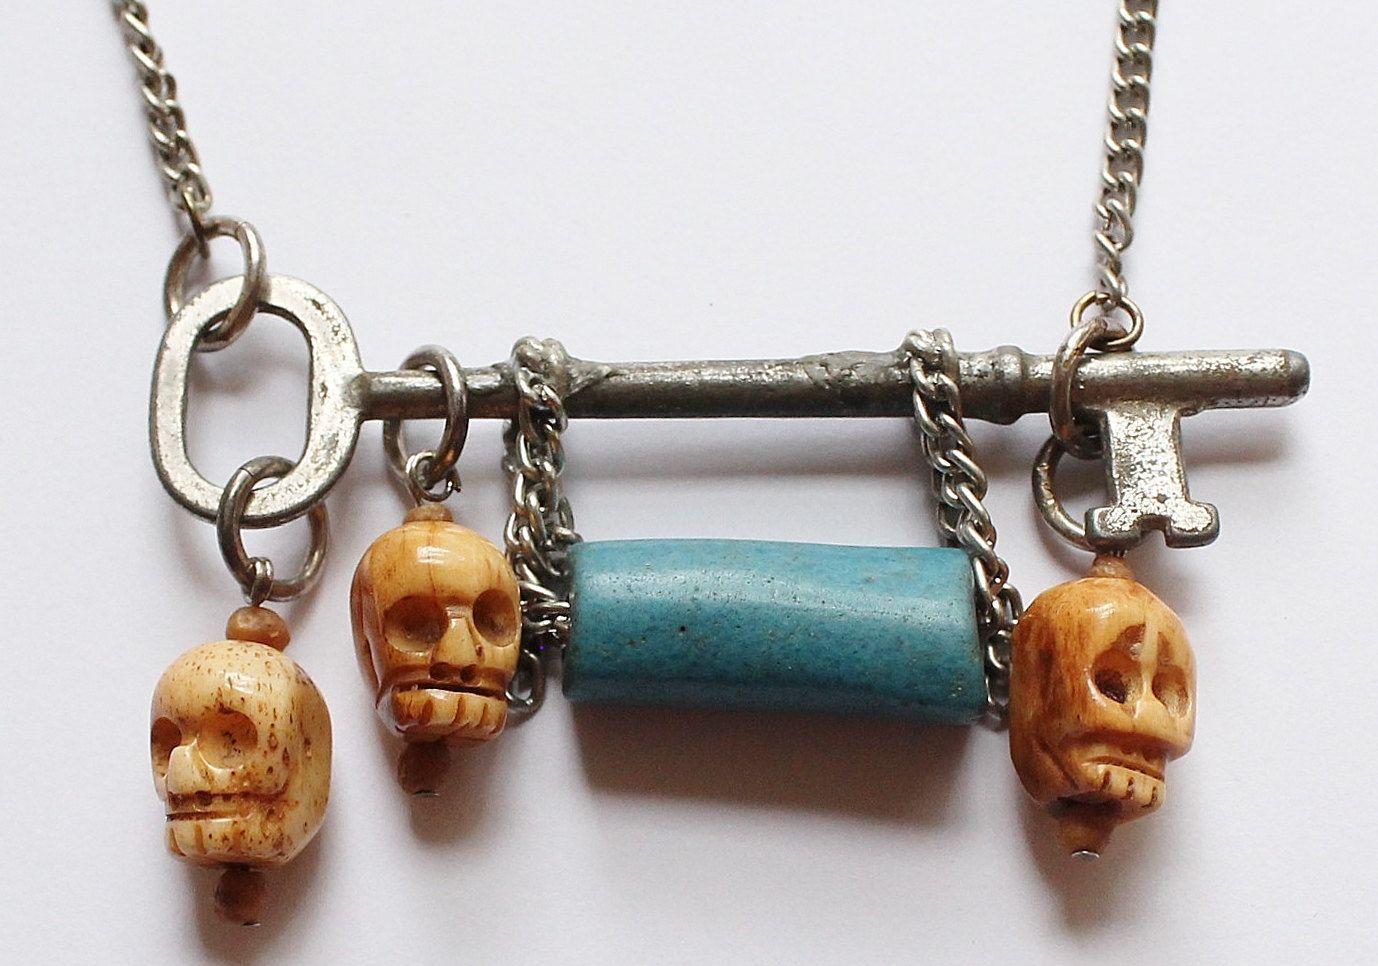 Antique Skeleton Key, Carved Bone Skull Pendant Necklace by paststore on Etsy